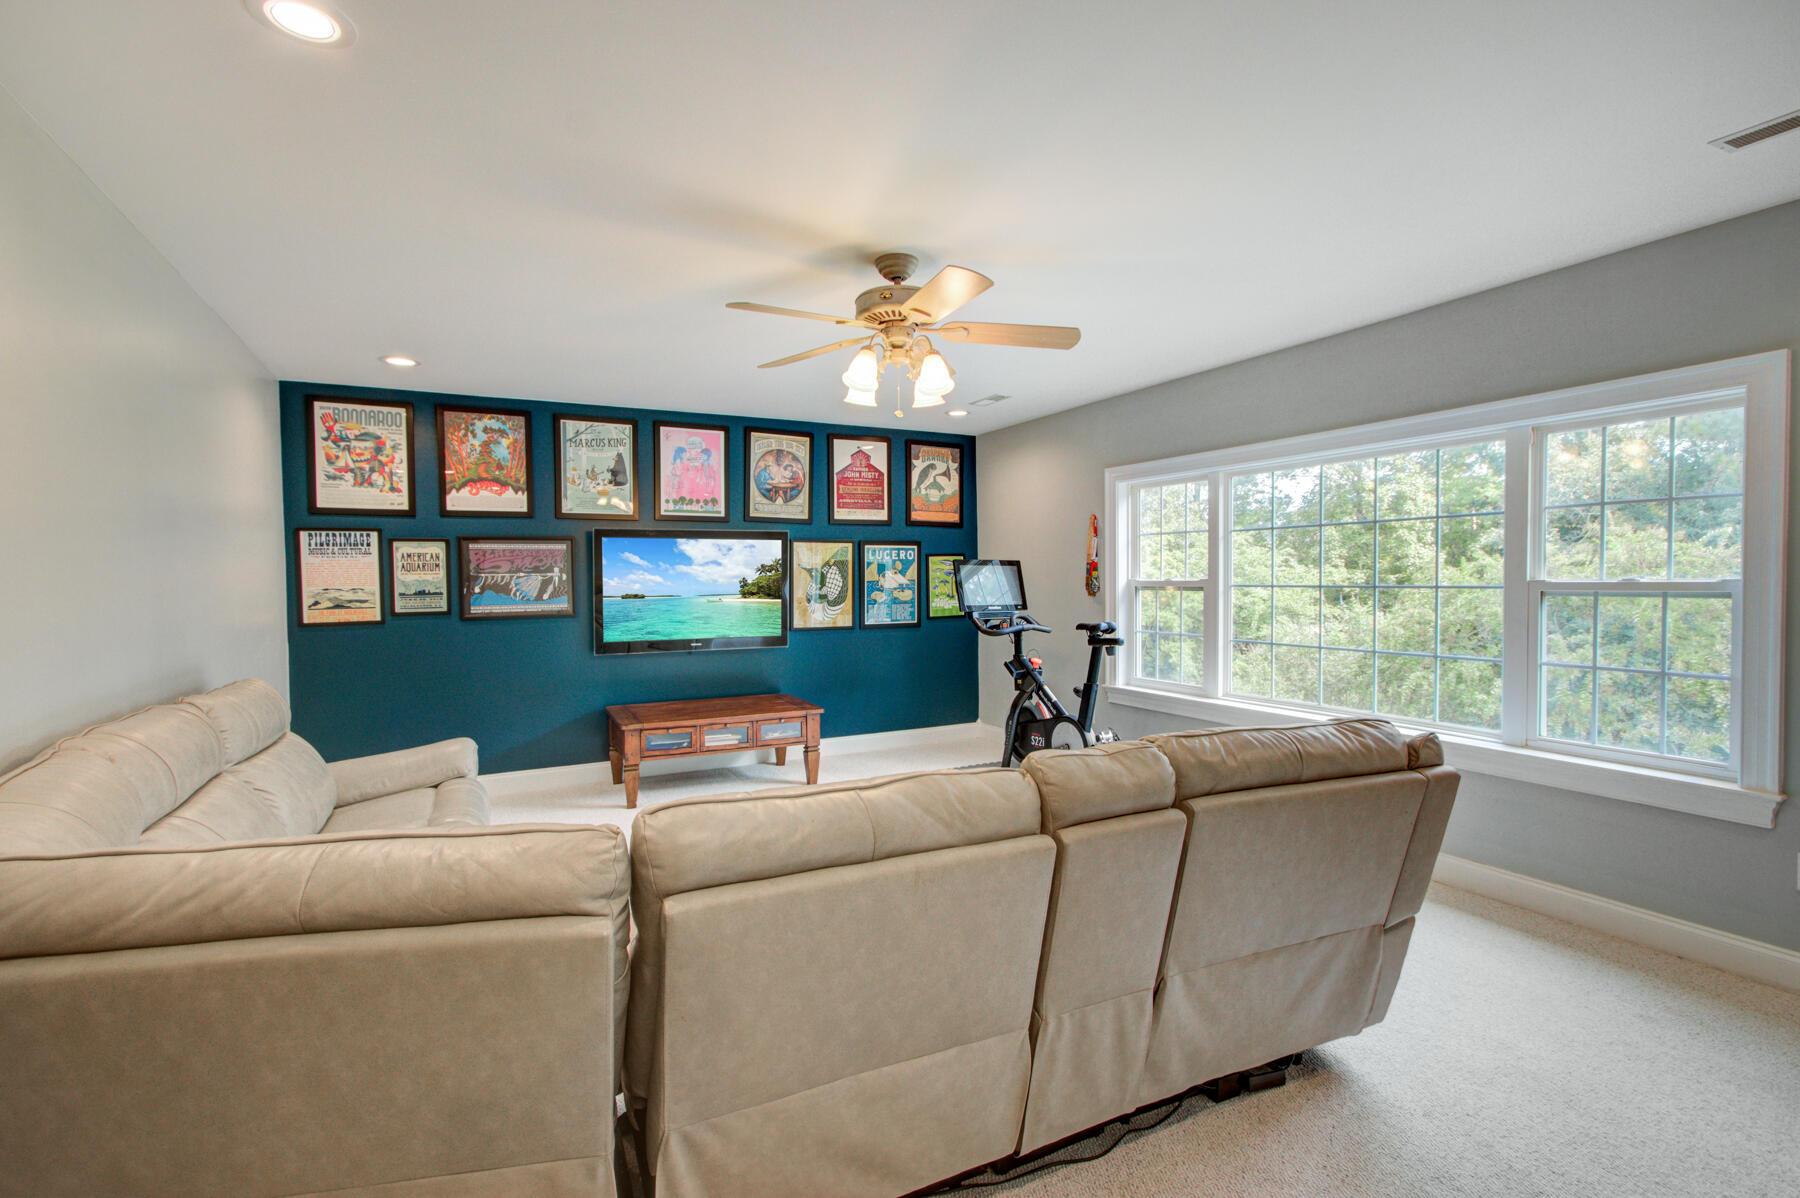 Dunes West Homes For Sale - 3095 Pignatelli, Mount Pleasant, SC - 23